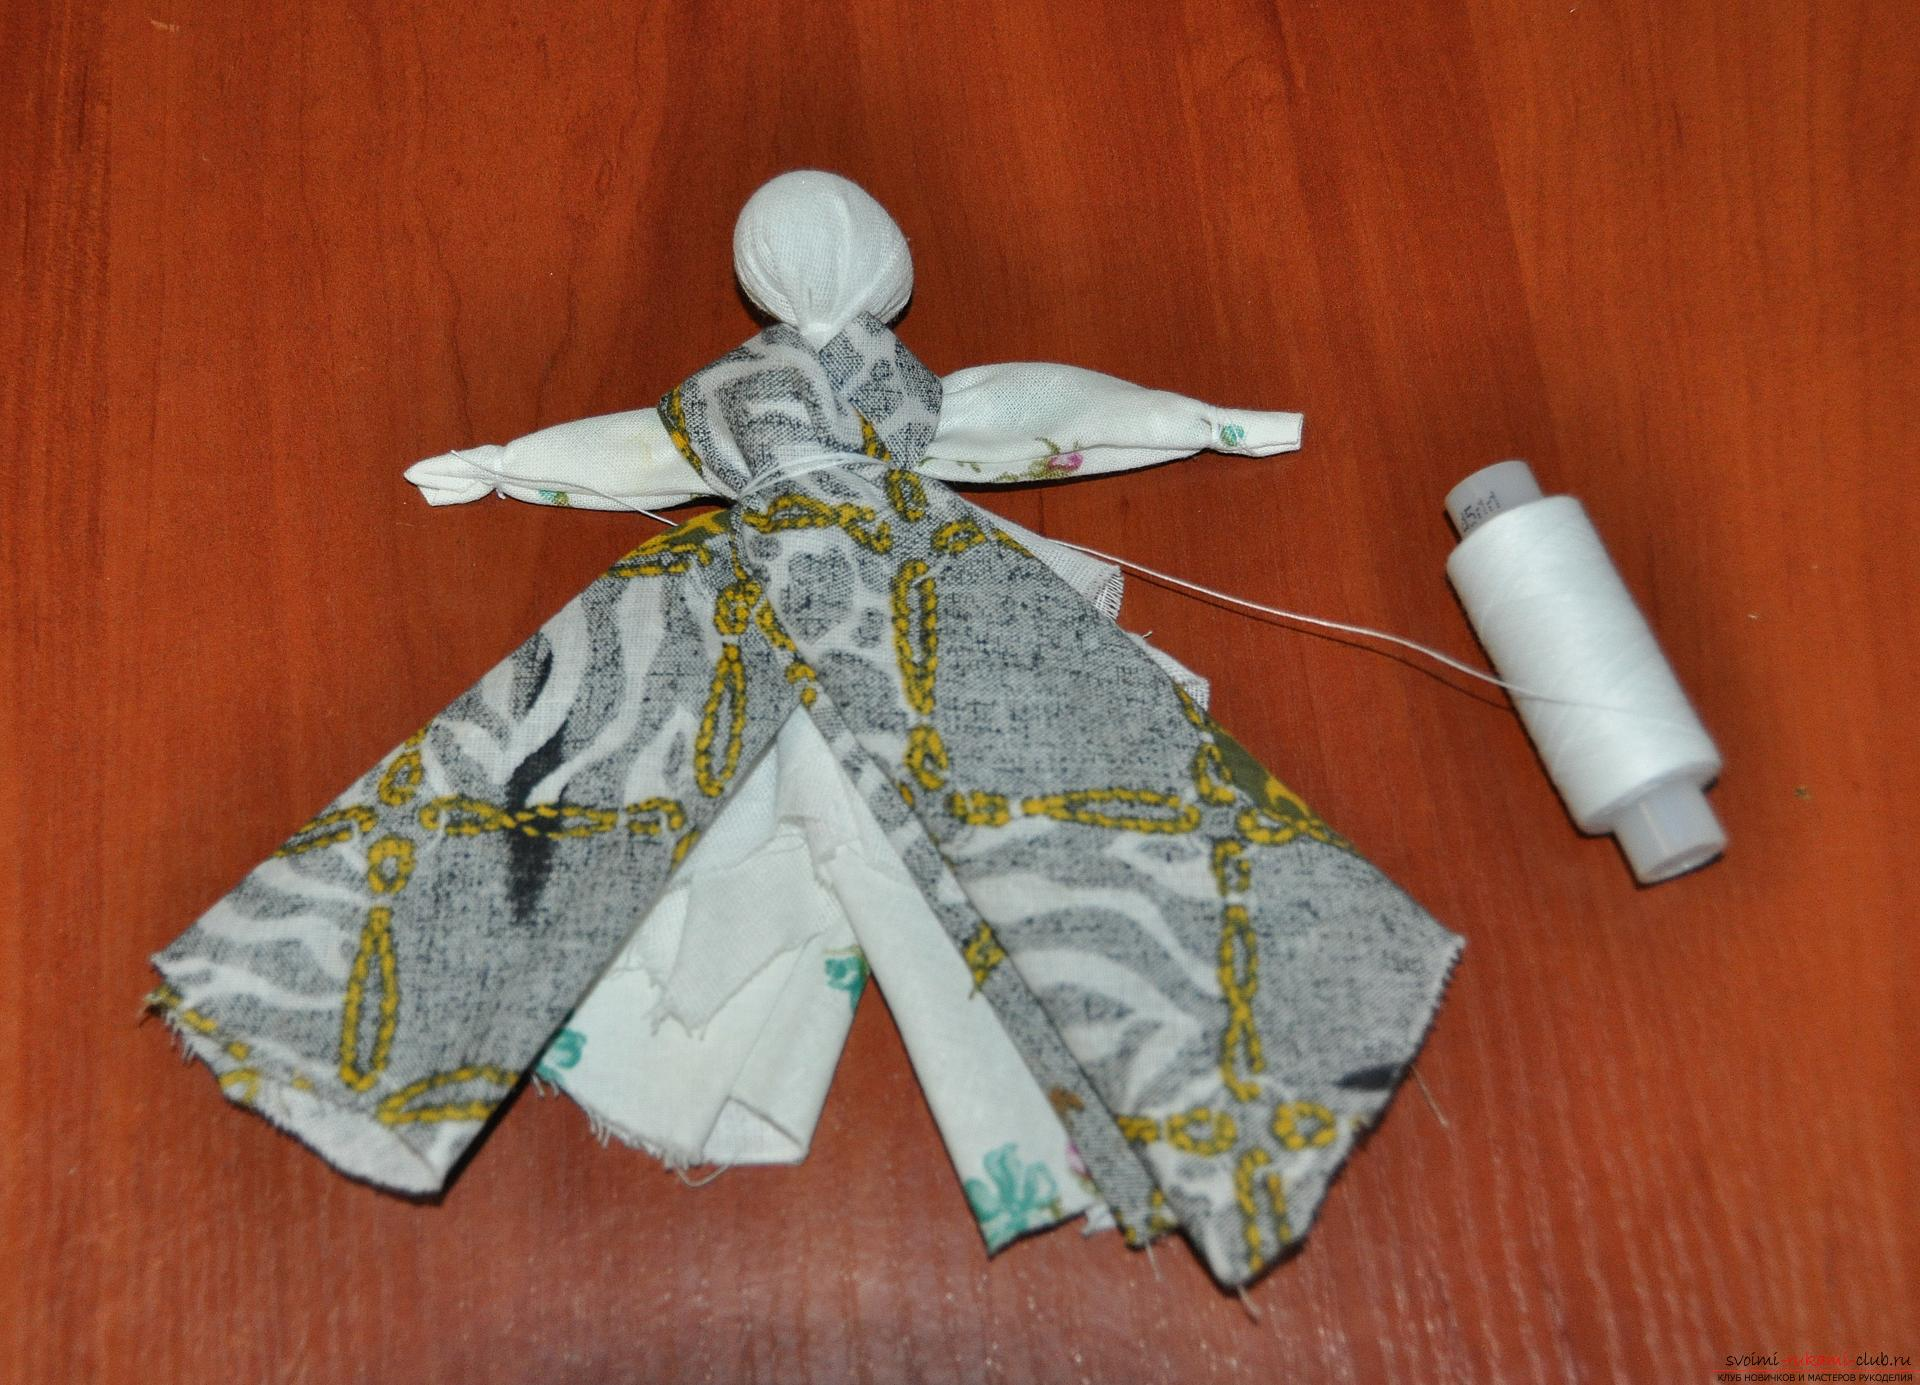 Этот мастер-класс научит как изготовить своими руками куклу-берегиню - столбушку. Фото №17